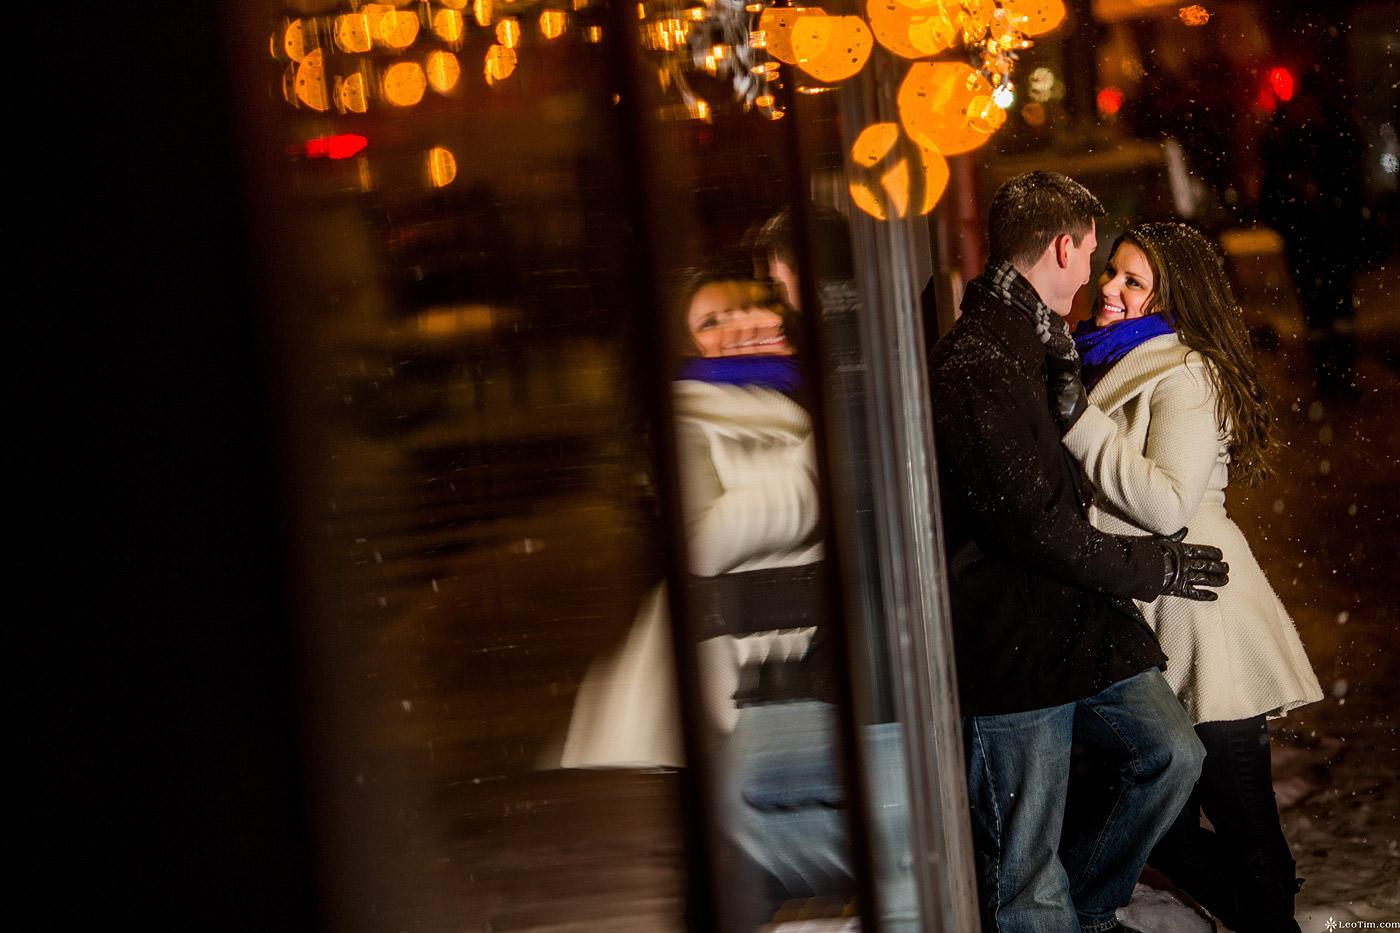 nyc-winter-engagement-photos-03.jpg